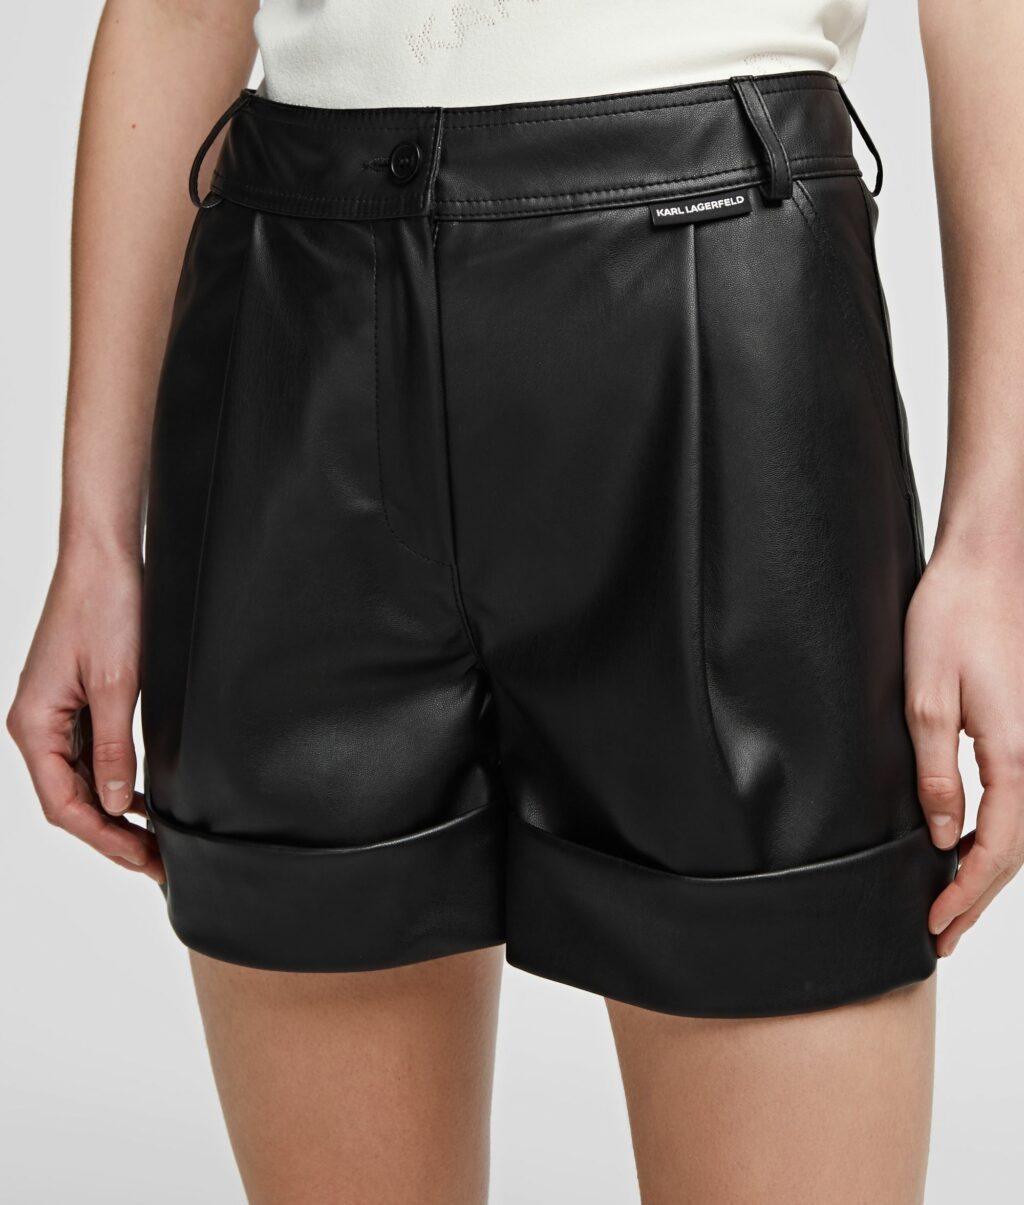 Karl Lagerfeld Øko Læder Shorts